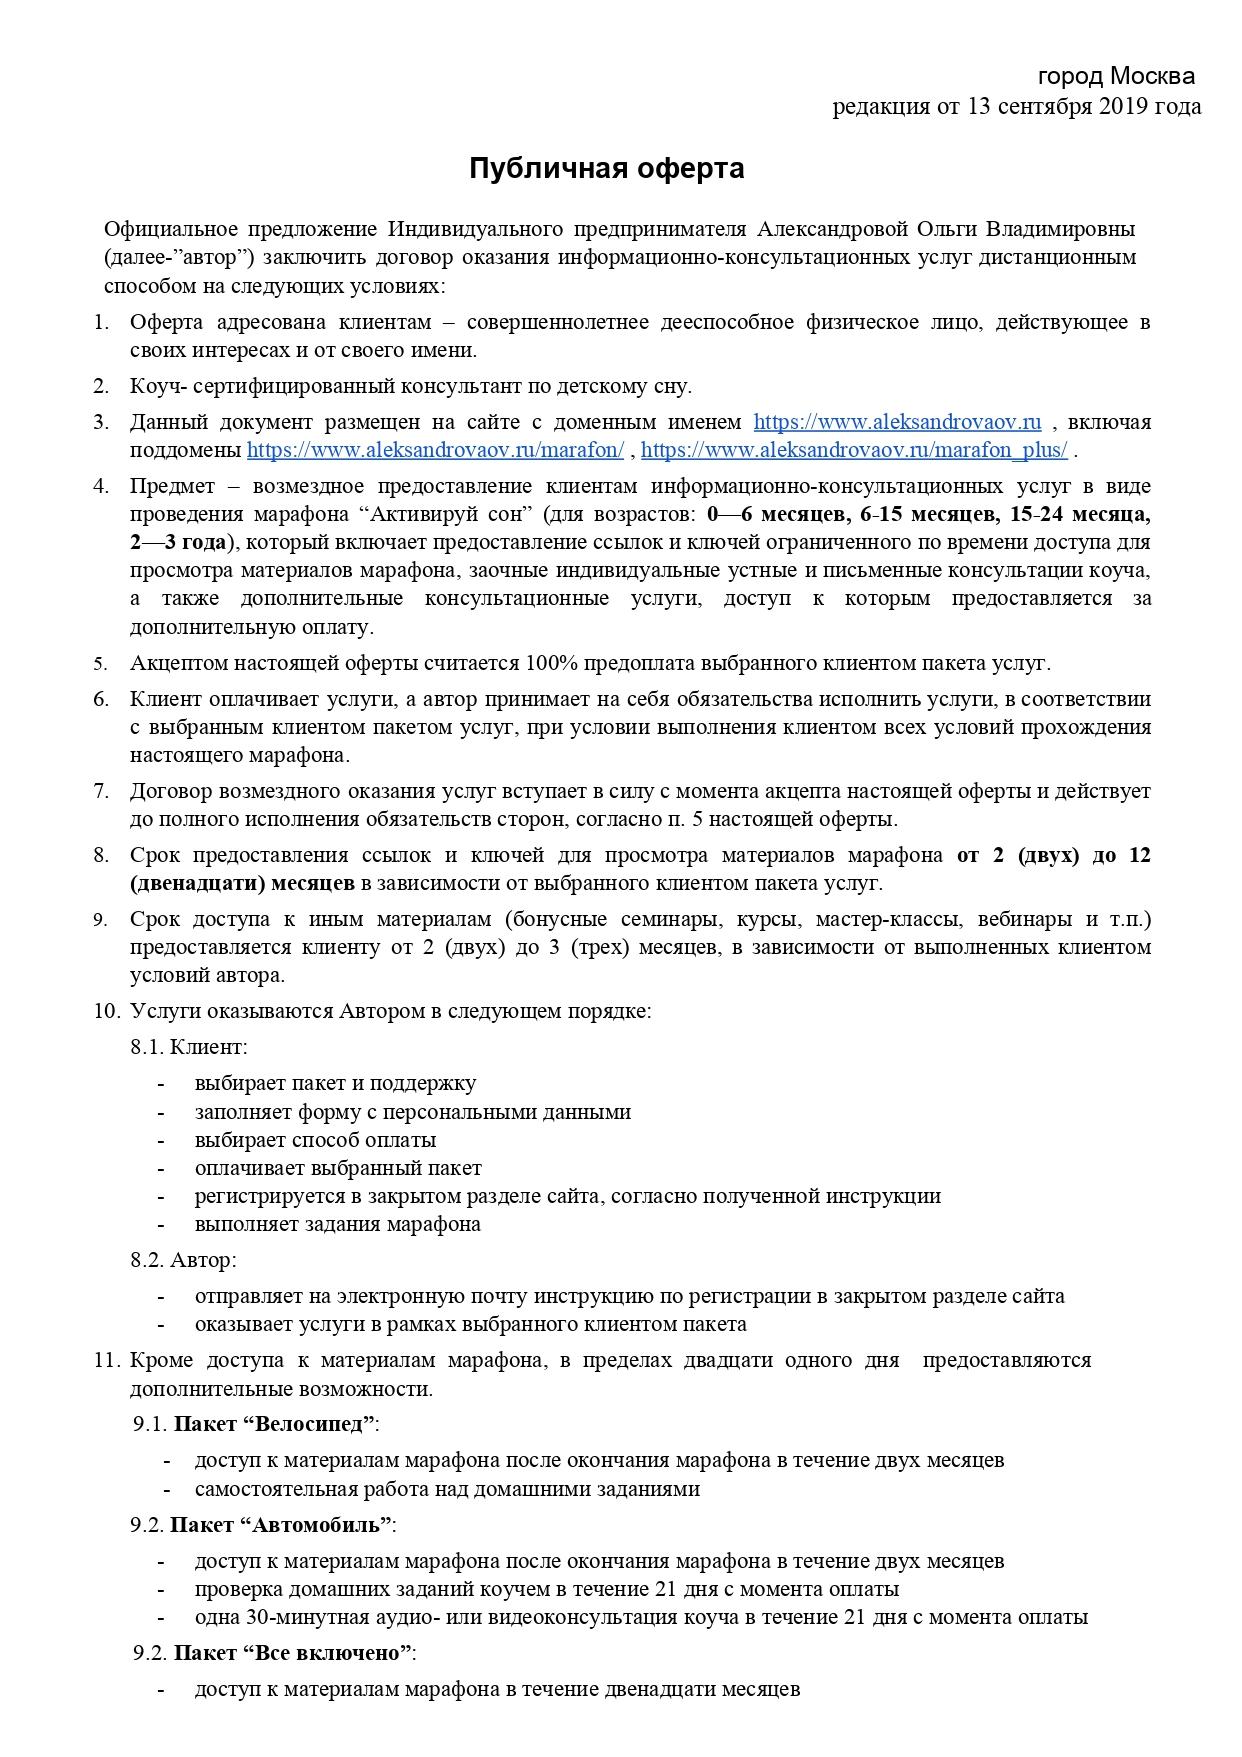 https://www.aleksandrovaov.ru/wp-content/uploads/2019/10/oferta-1.jpg